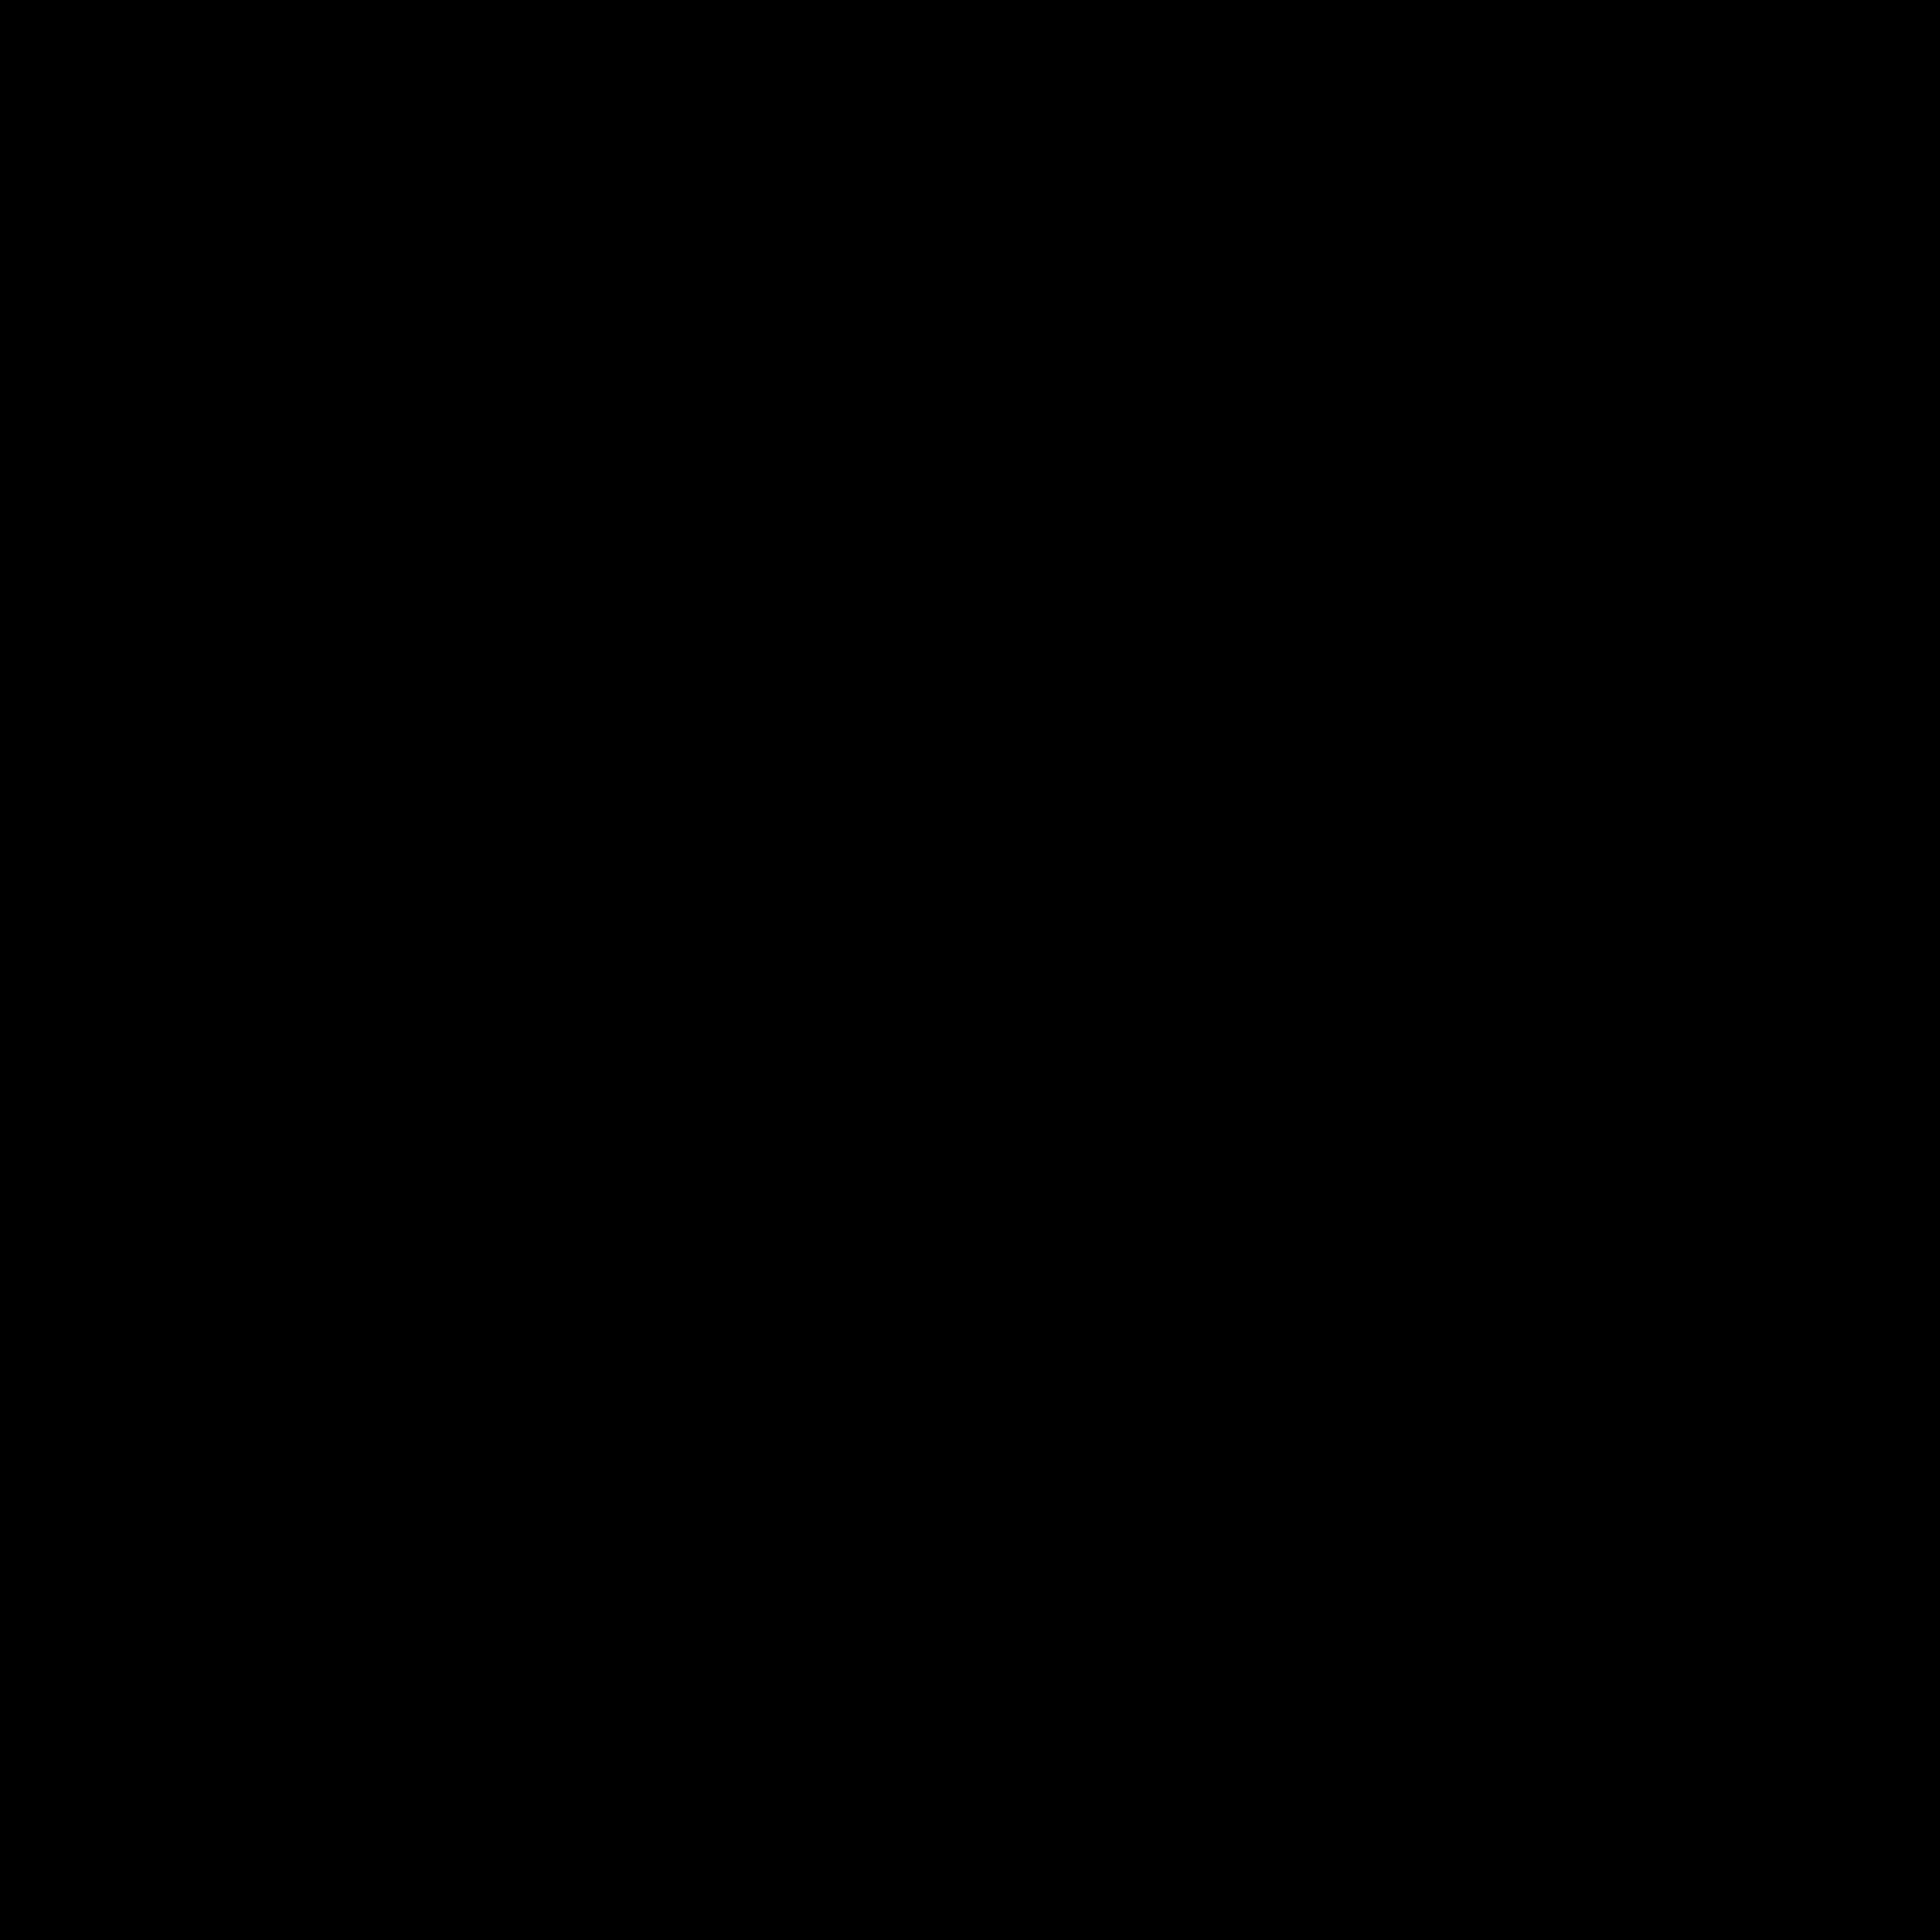 Clipart - World Religious Symbols Silhouette